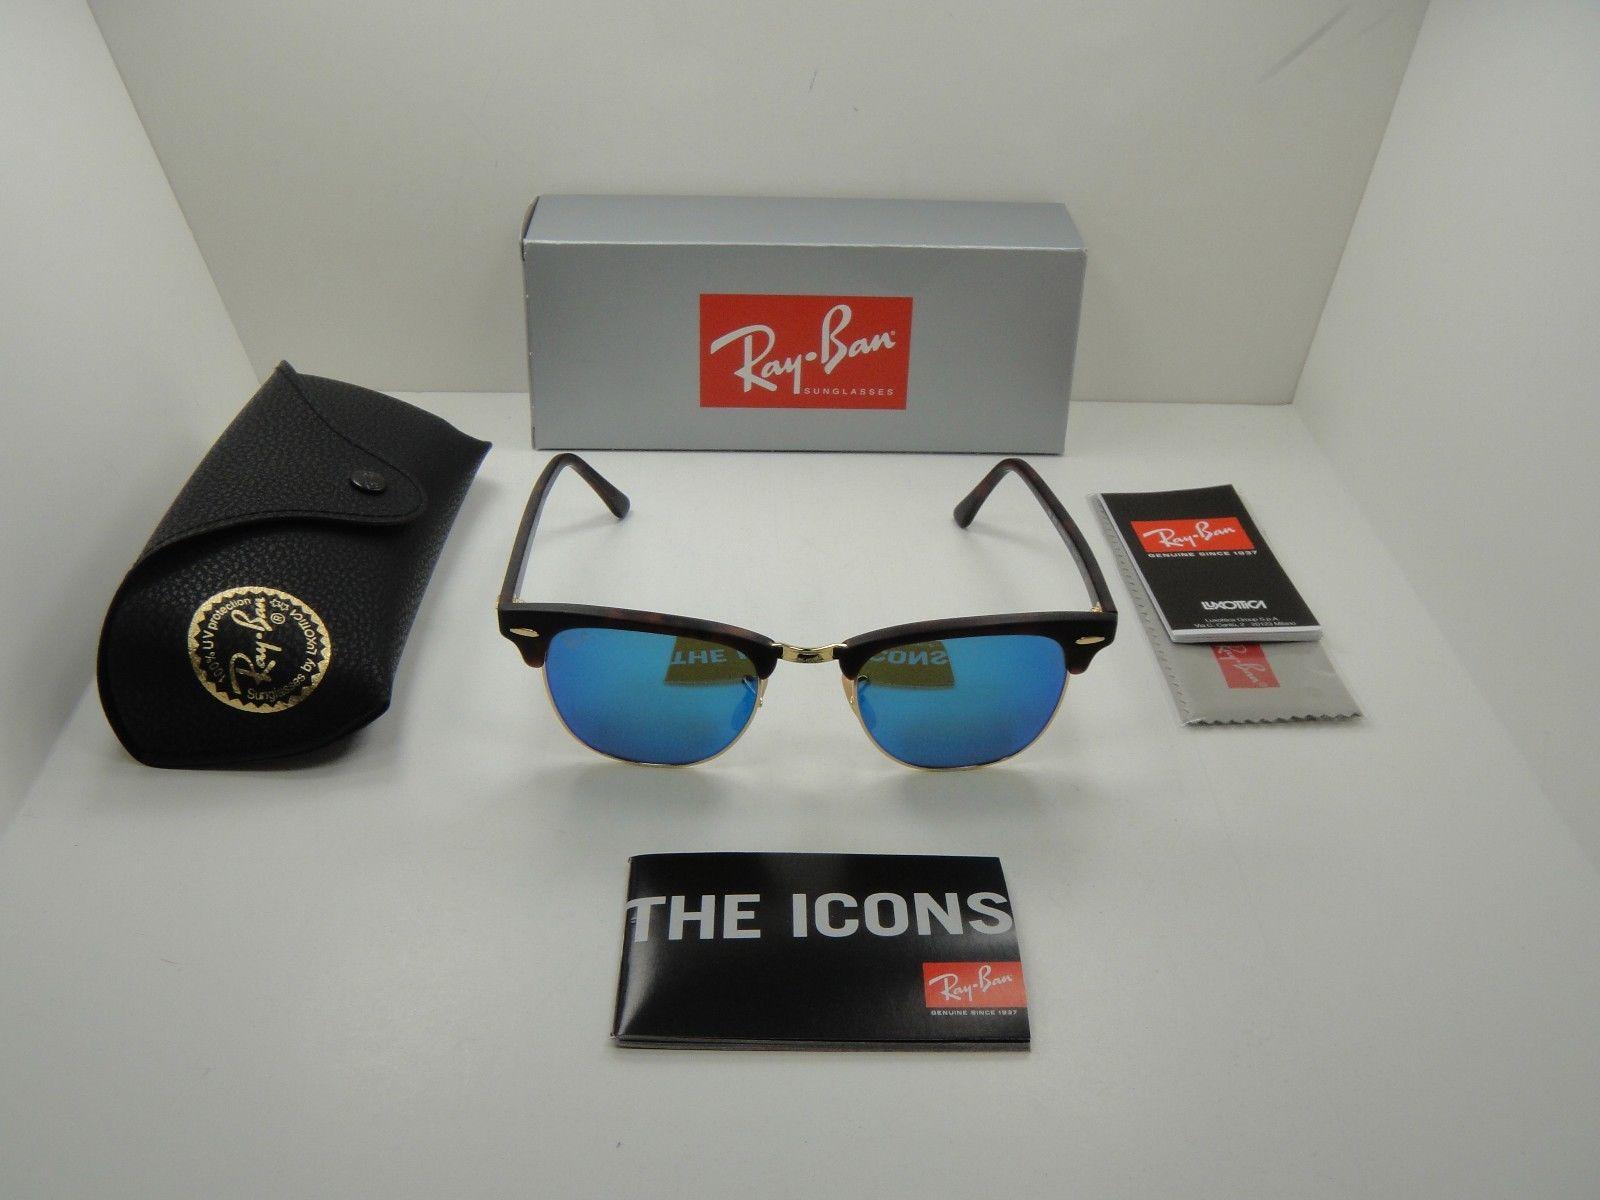 Ray Ban RB3016 114517 Clubmaster Blue Flash Mirror 51mm